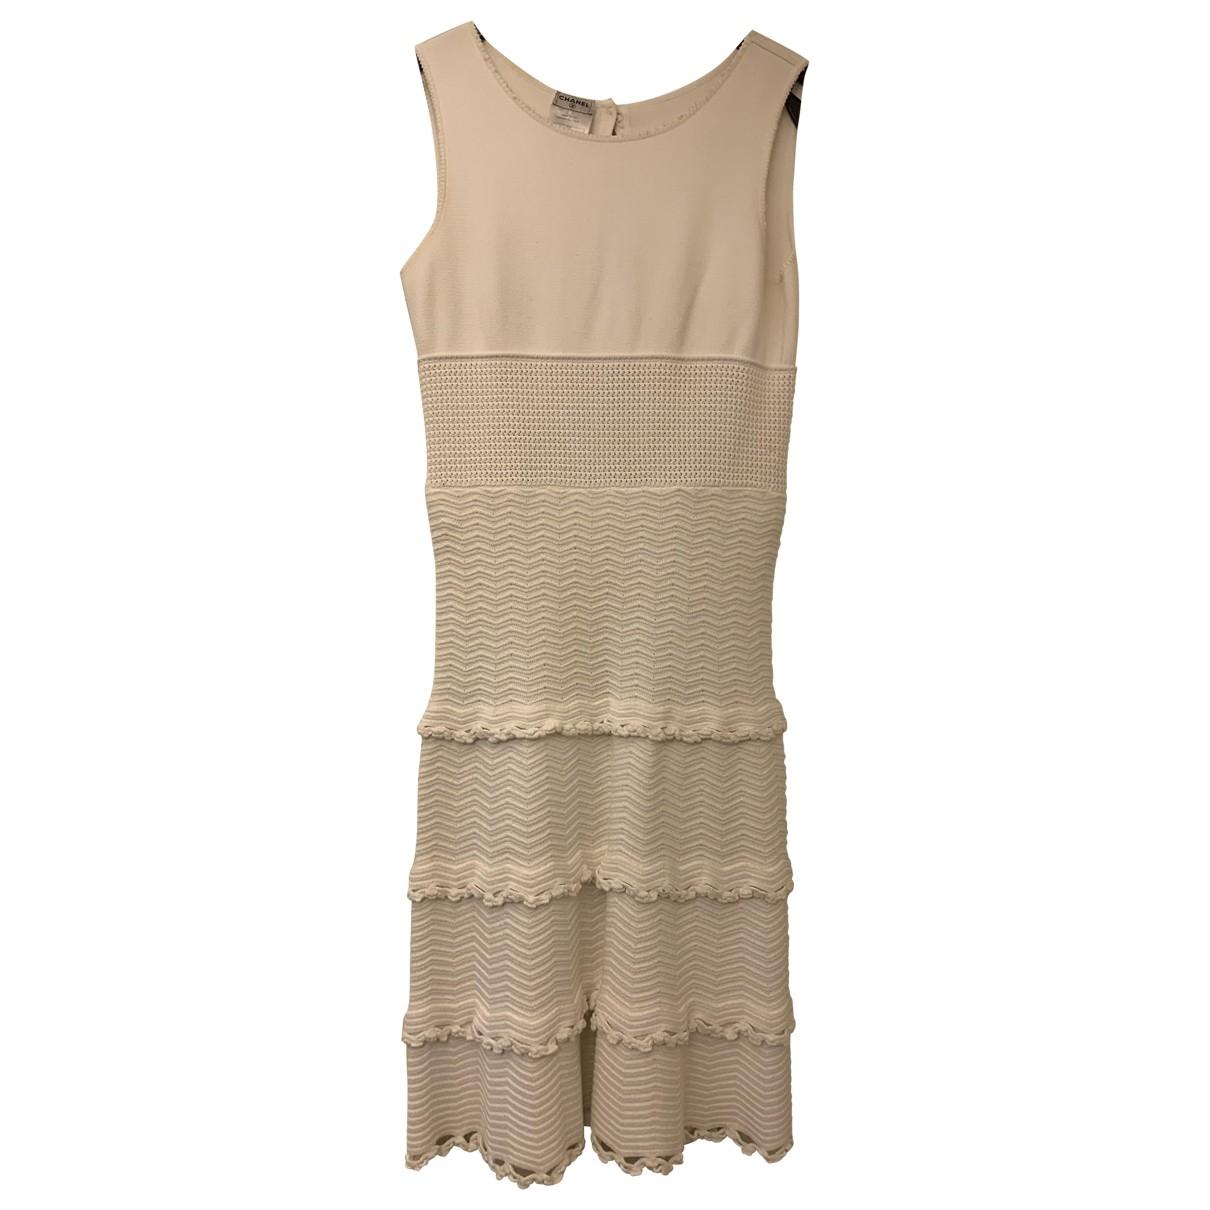 Chanel \N White Cotton dress for Women 40 FR